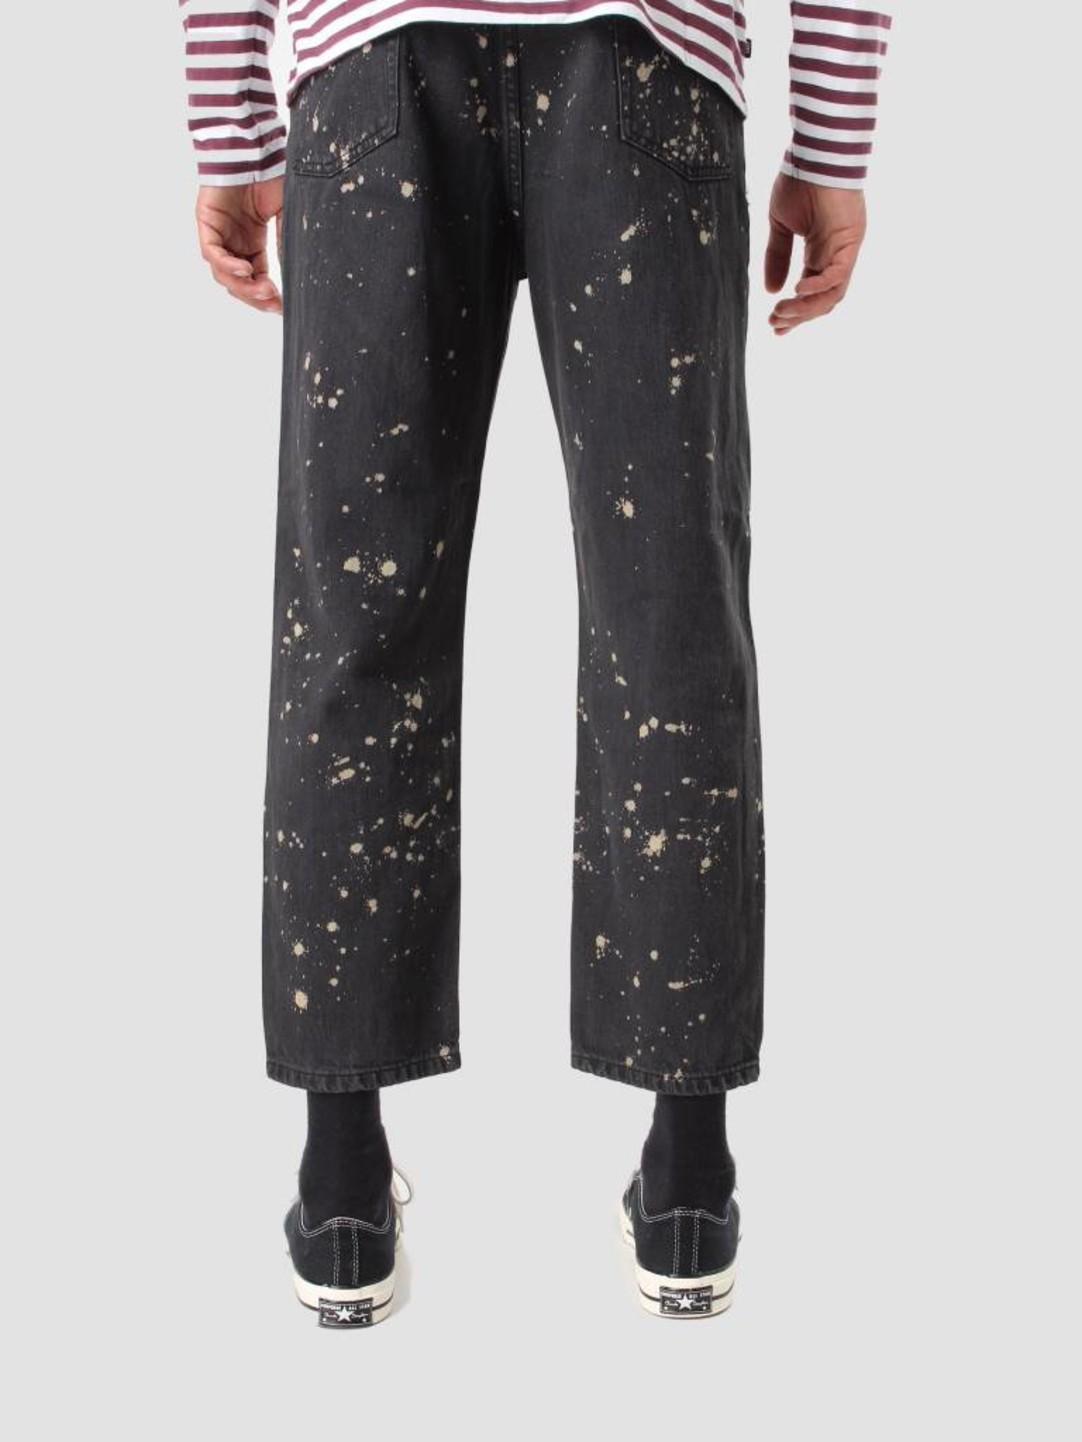 Obey Obey Bender 90's Overdye Denim Pants Bleached Black 142010049 Bla